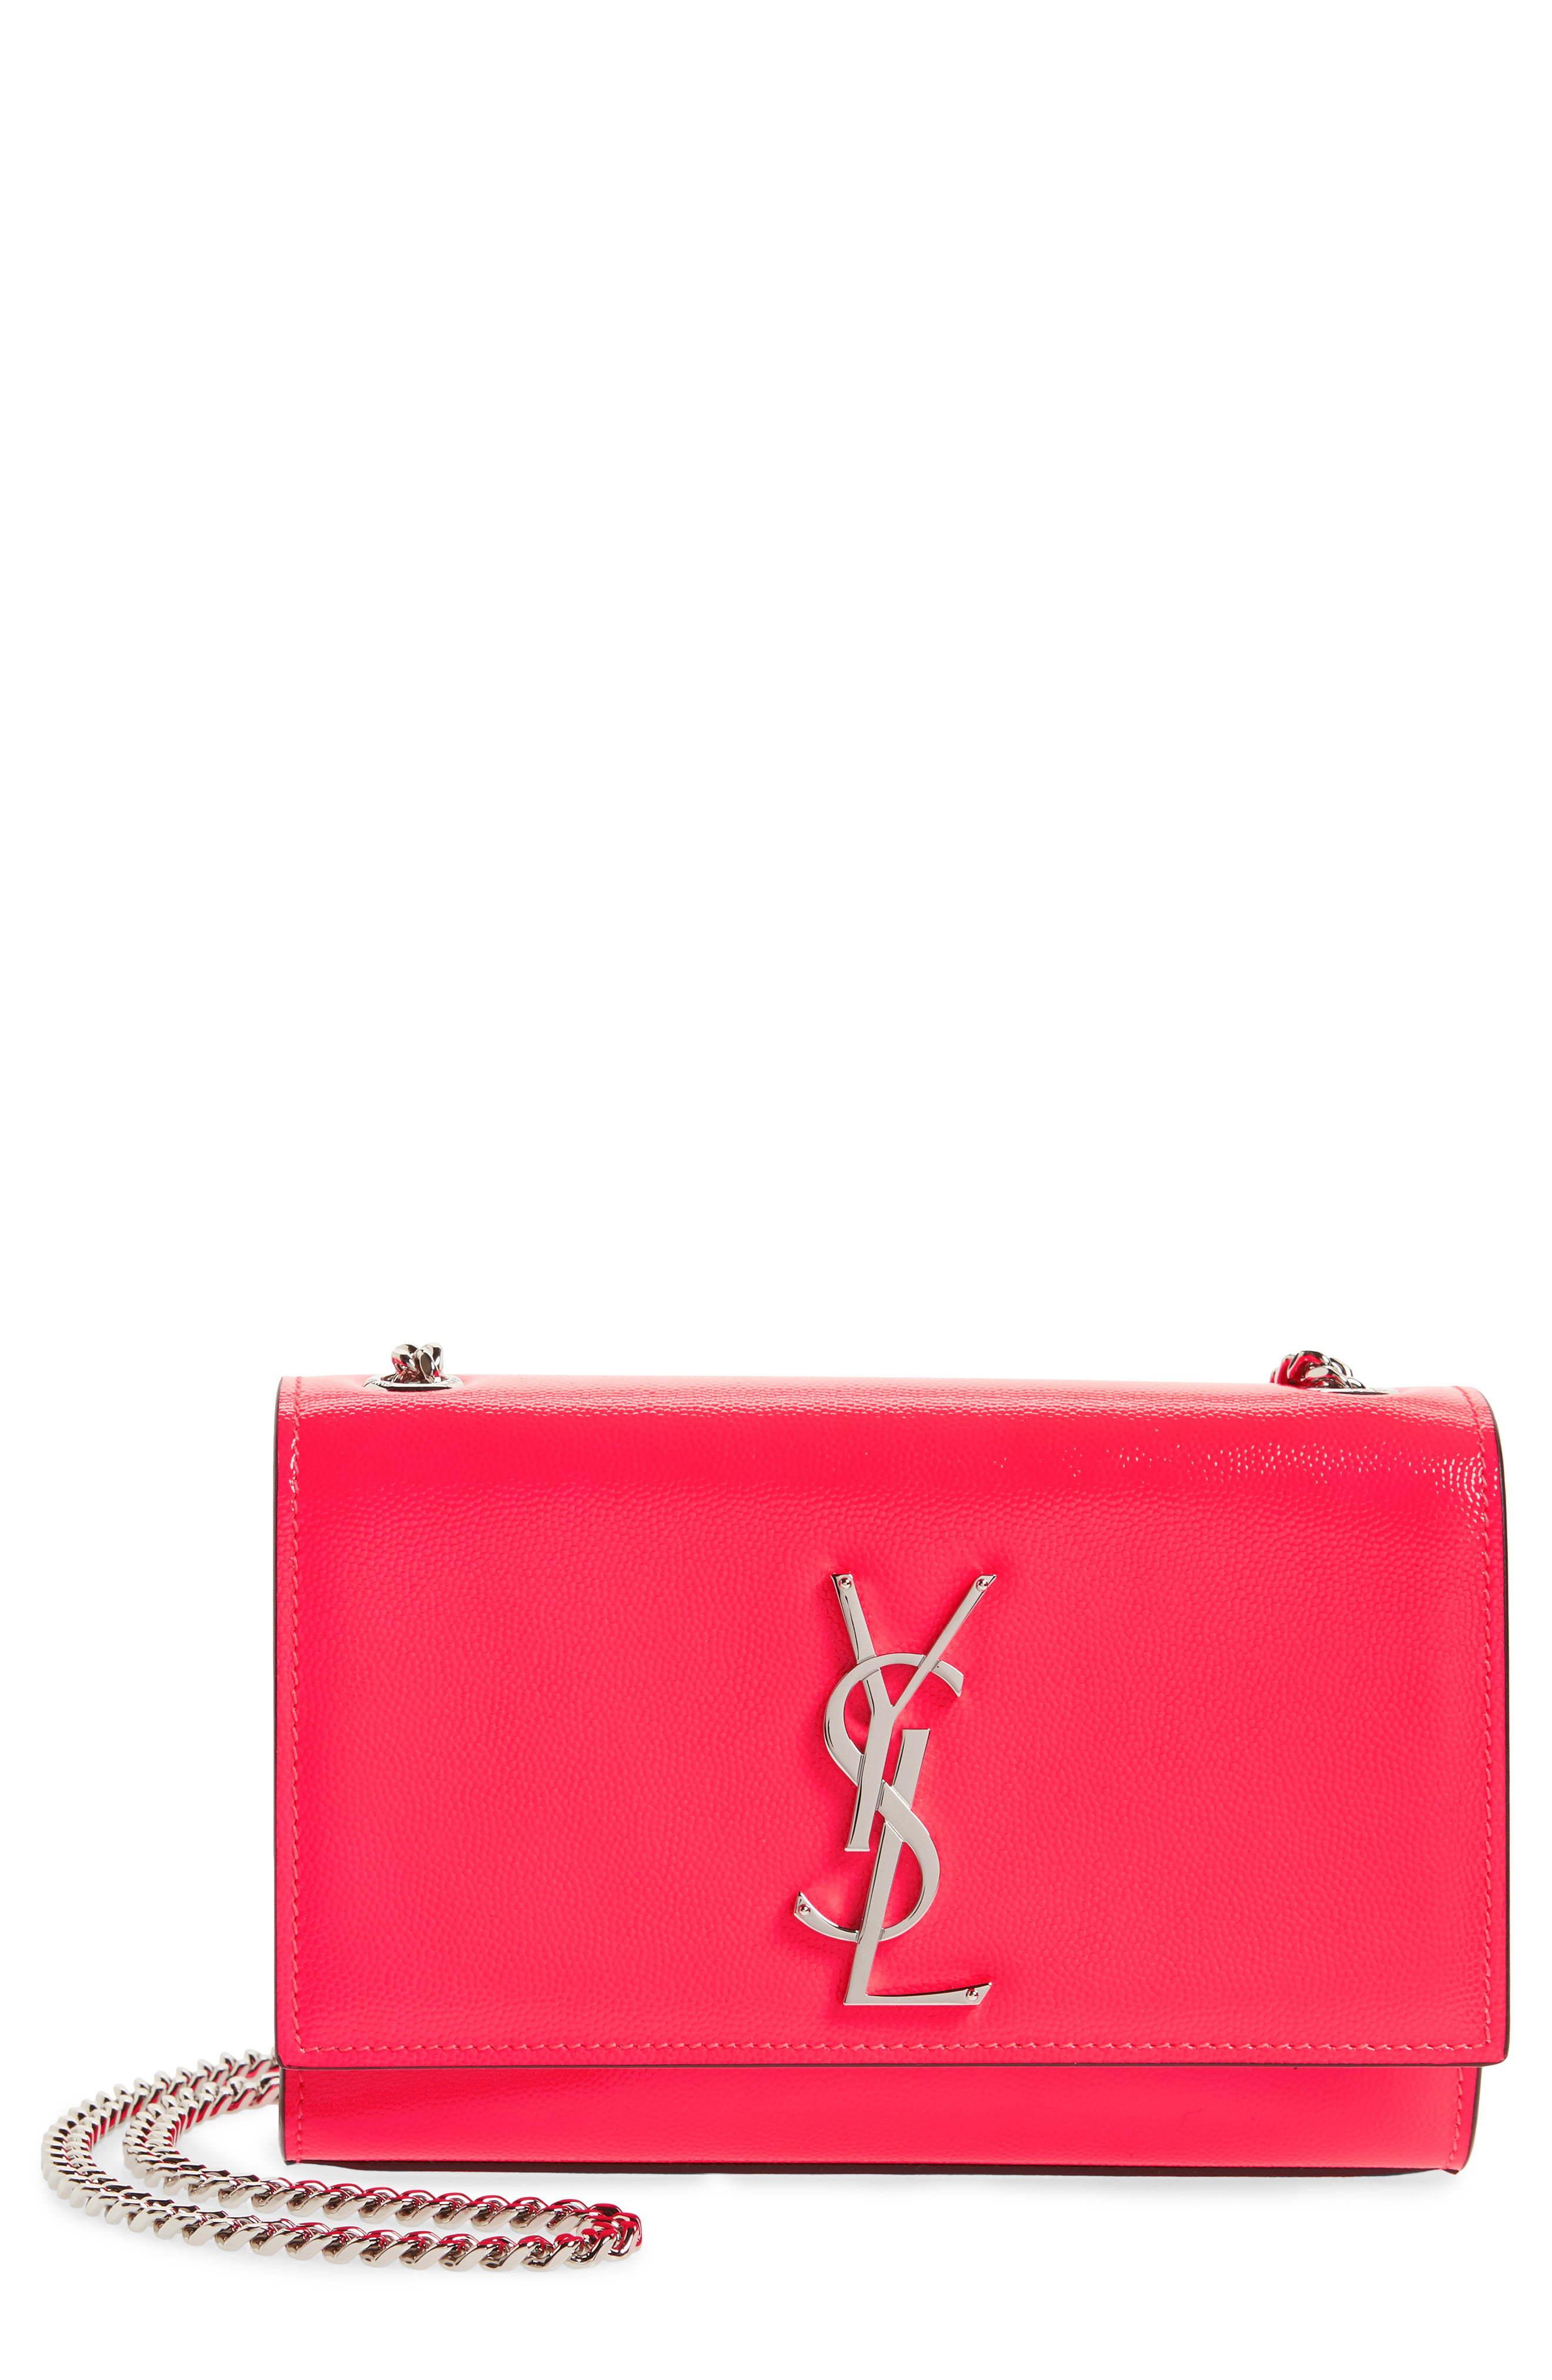 Saint Laurent Small Kate Calfskin Leather Crossbody Bag